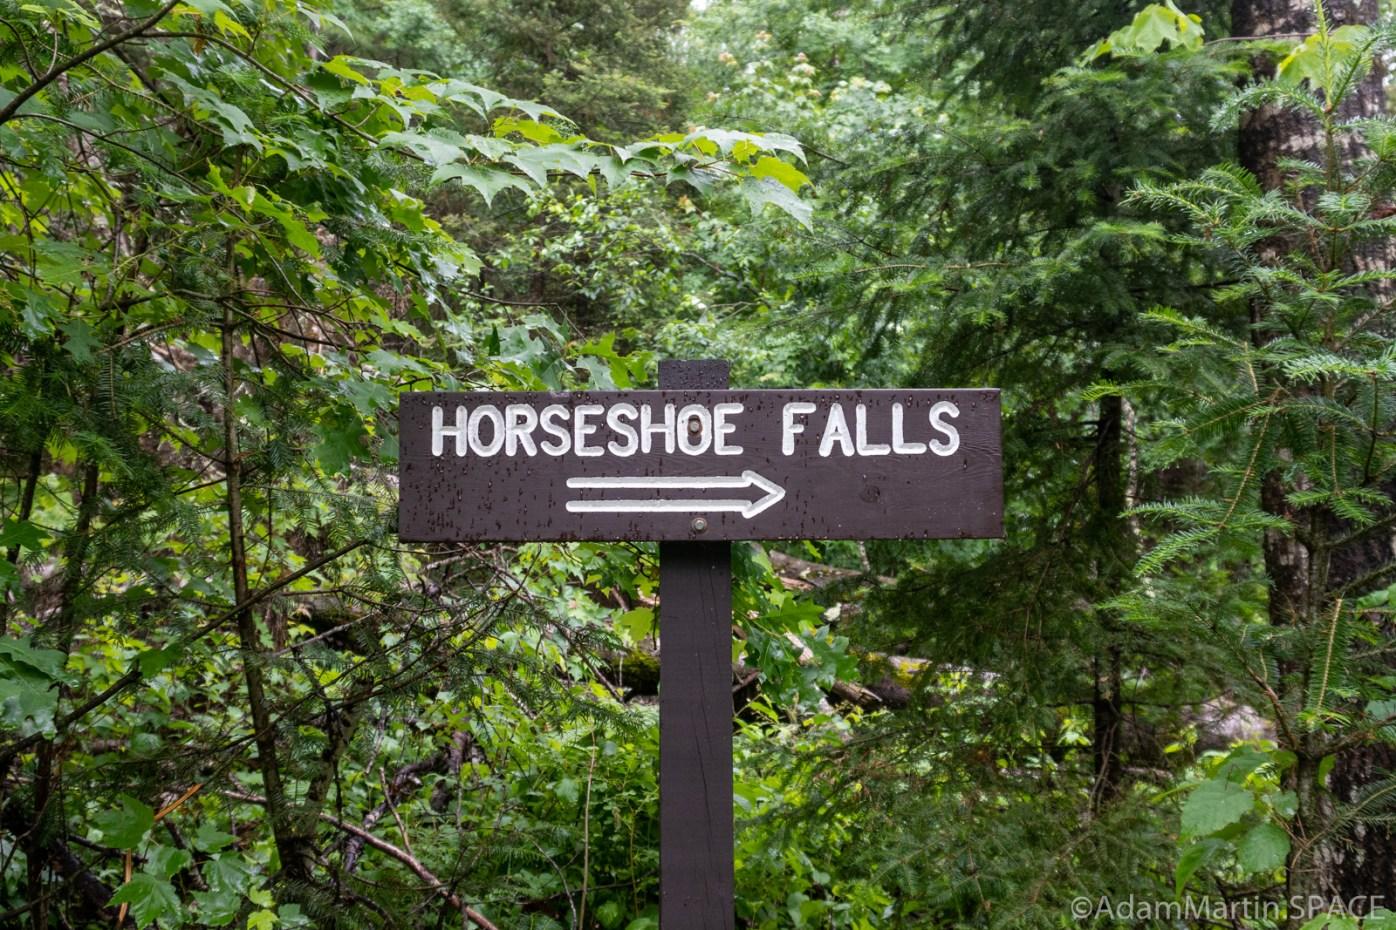 Horseshoe Falls - Sign at trail head